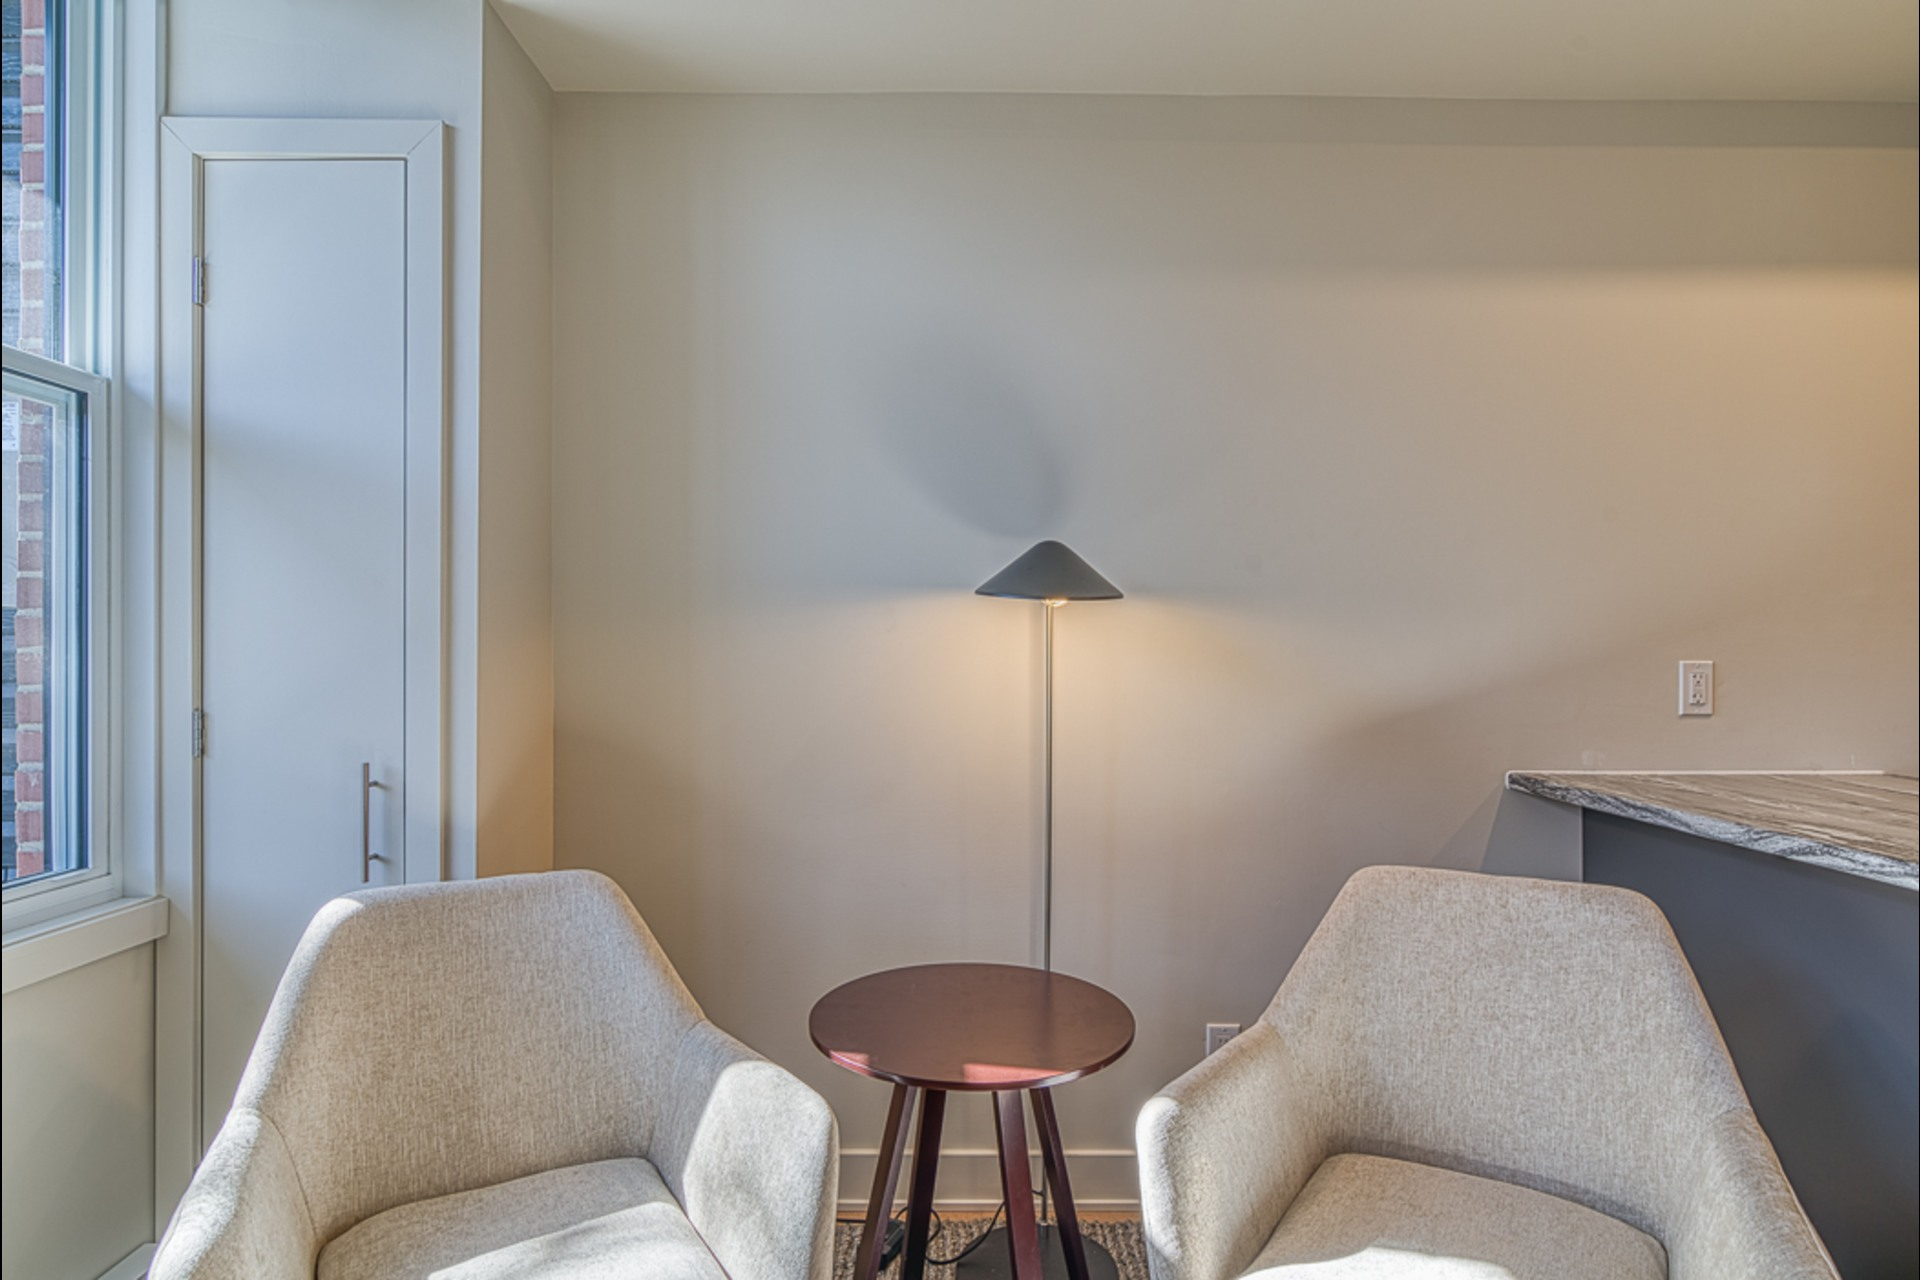 image 15 - Furnished Appartement For rent Montréal - 3 rooms